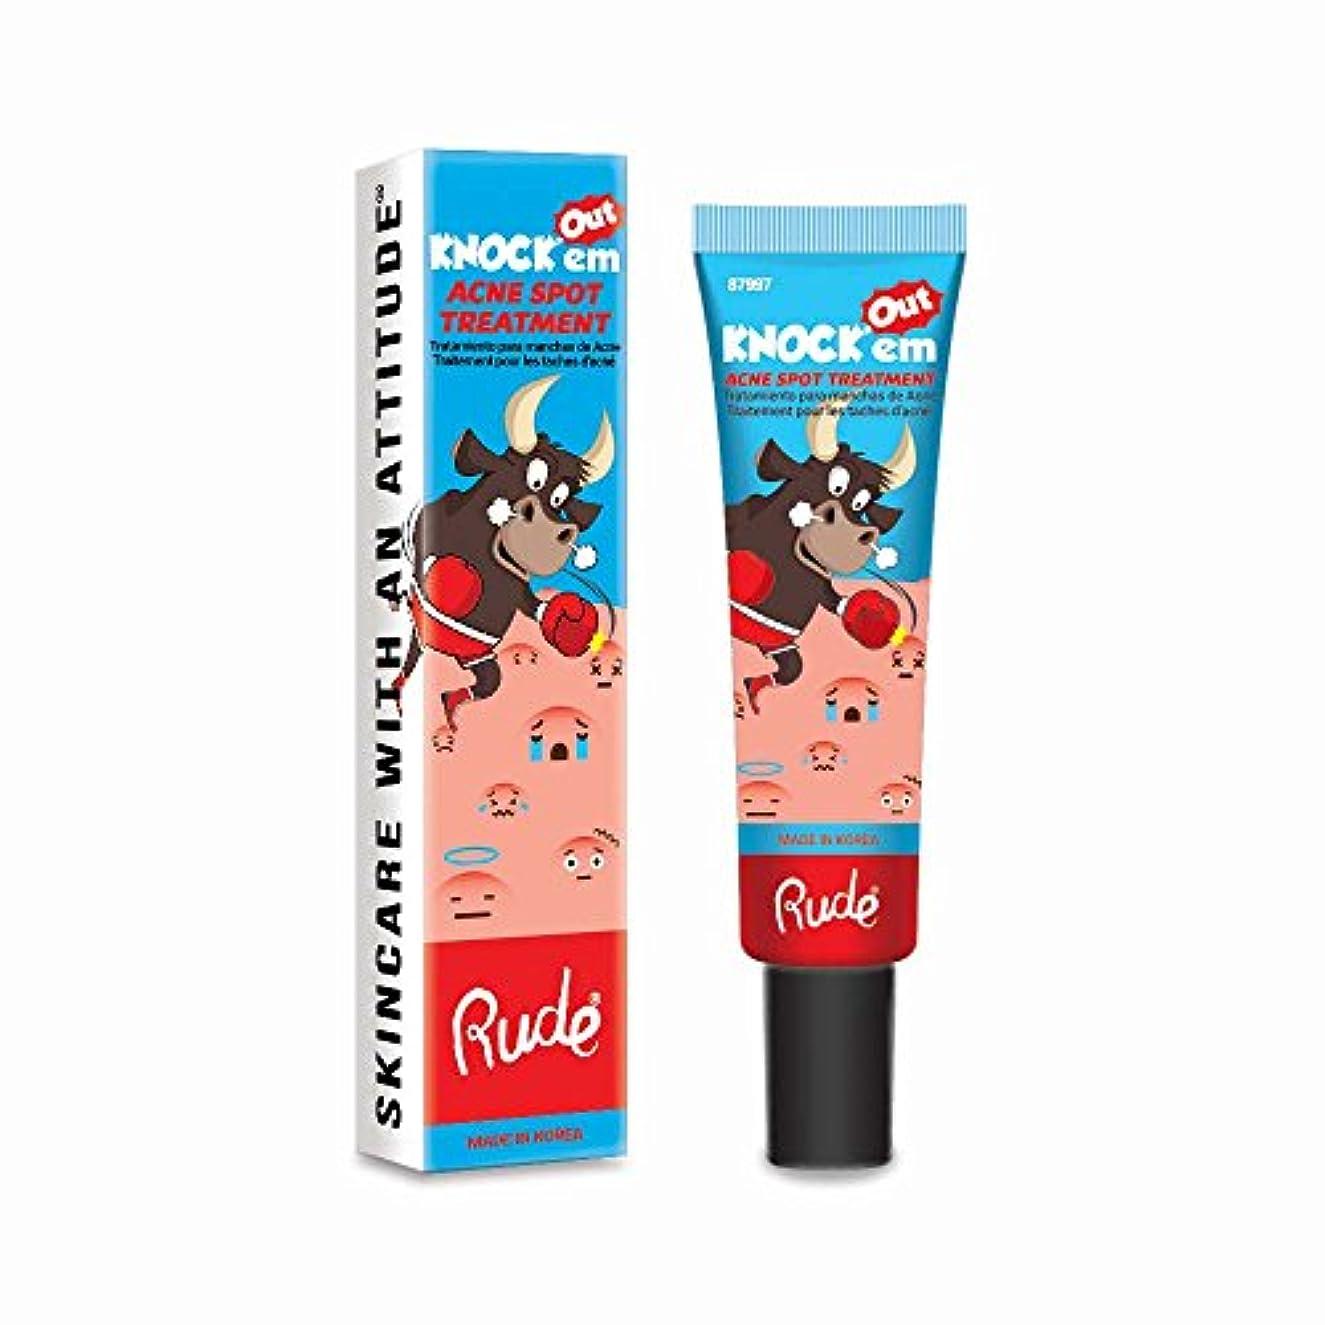 RUDE Knock'em Acne Spot Treatment (並行輸入品)